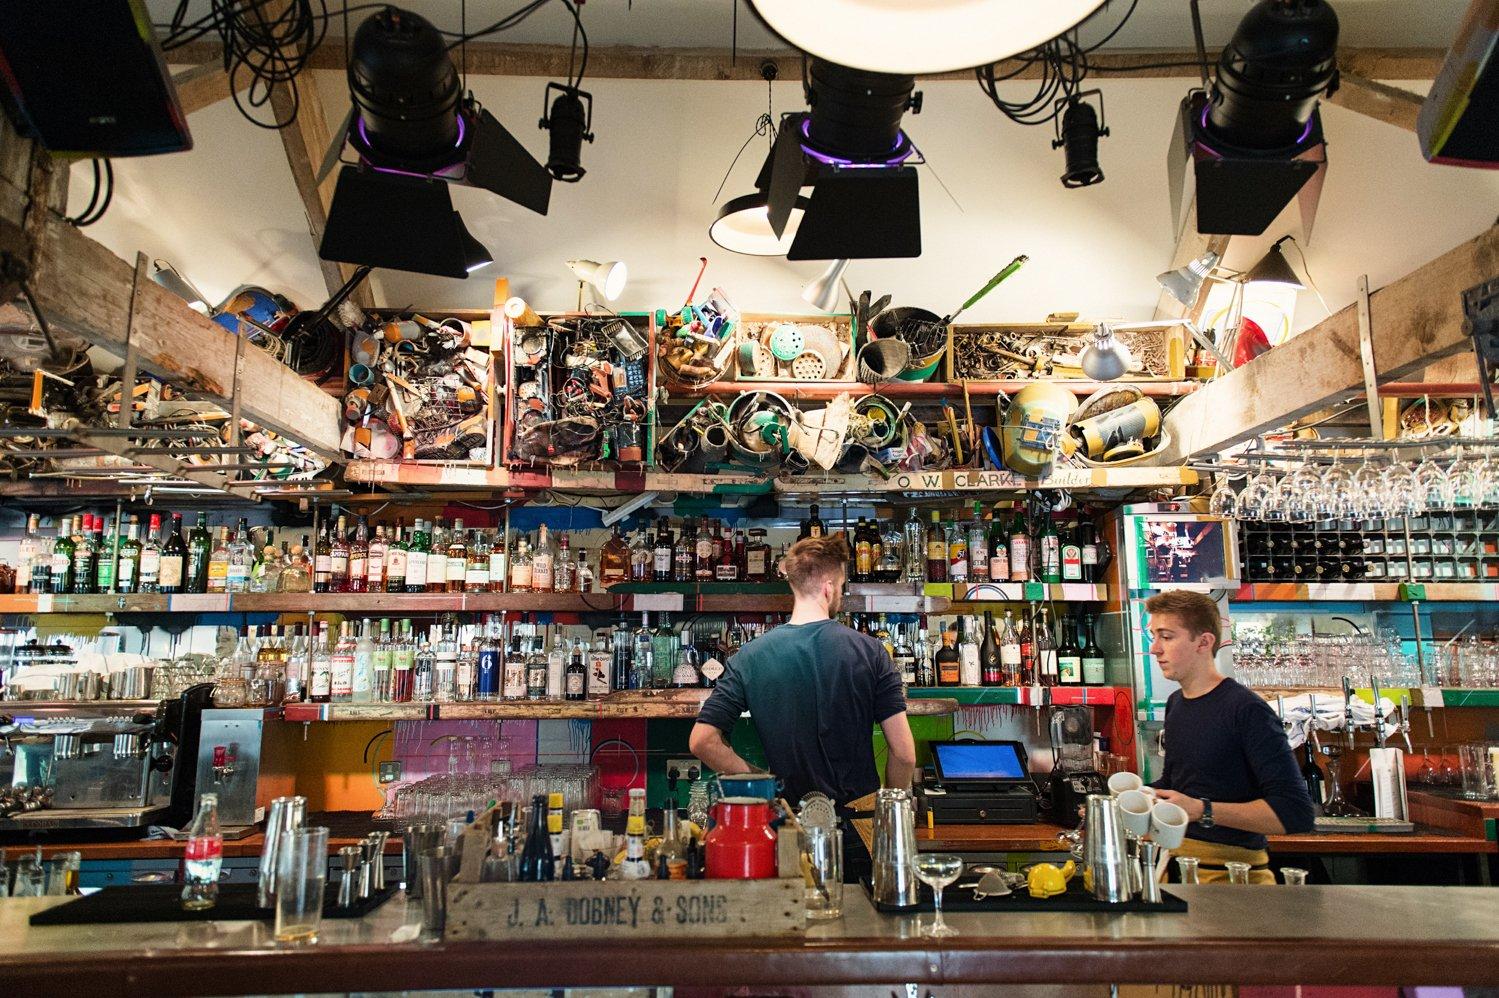 The drinks bar Hauser & Wirth wedding venue Somerset